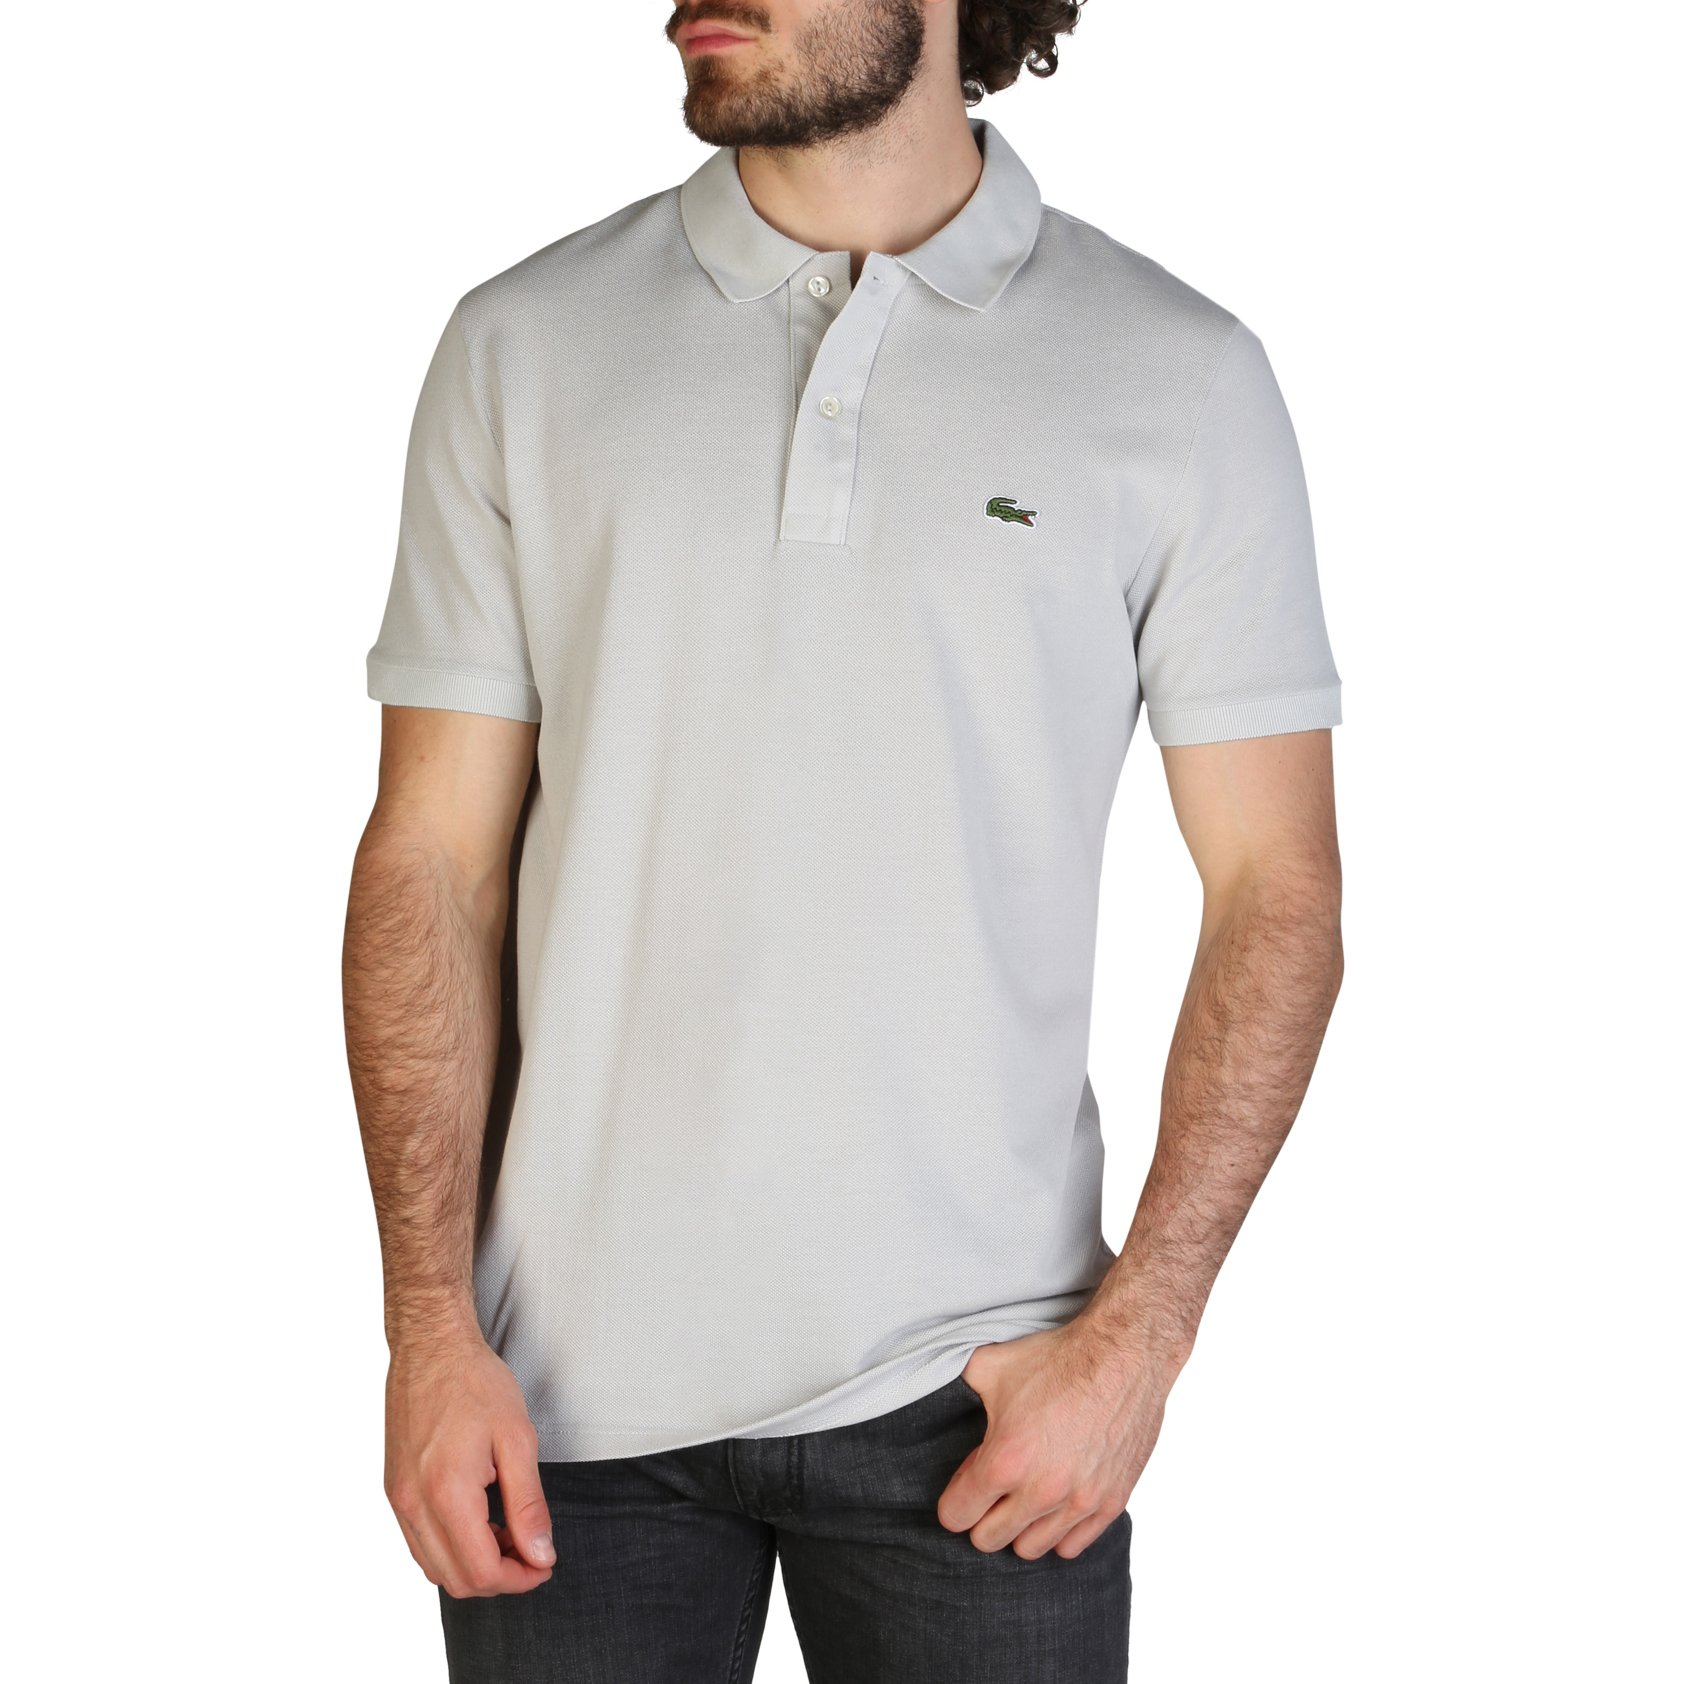 Lacoste Men's Polo Shirt Various Colours PH4012_SLIM - grey S